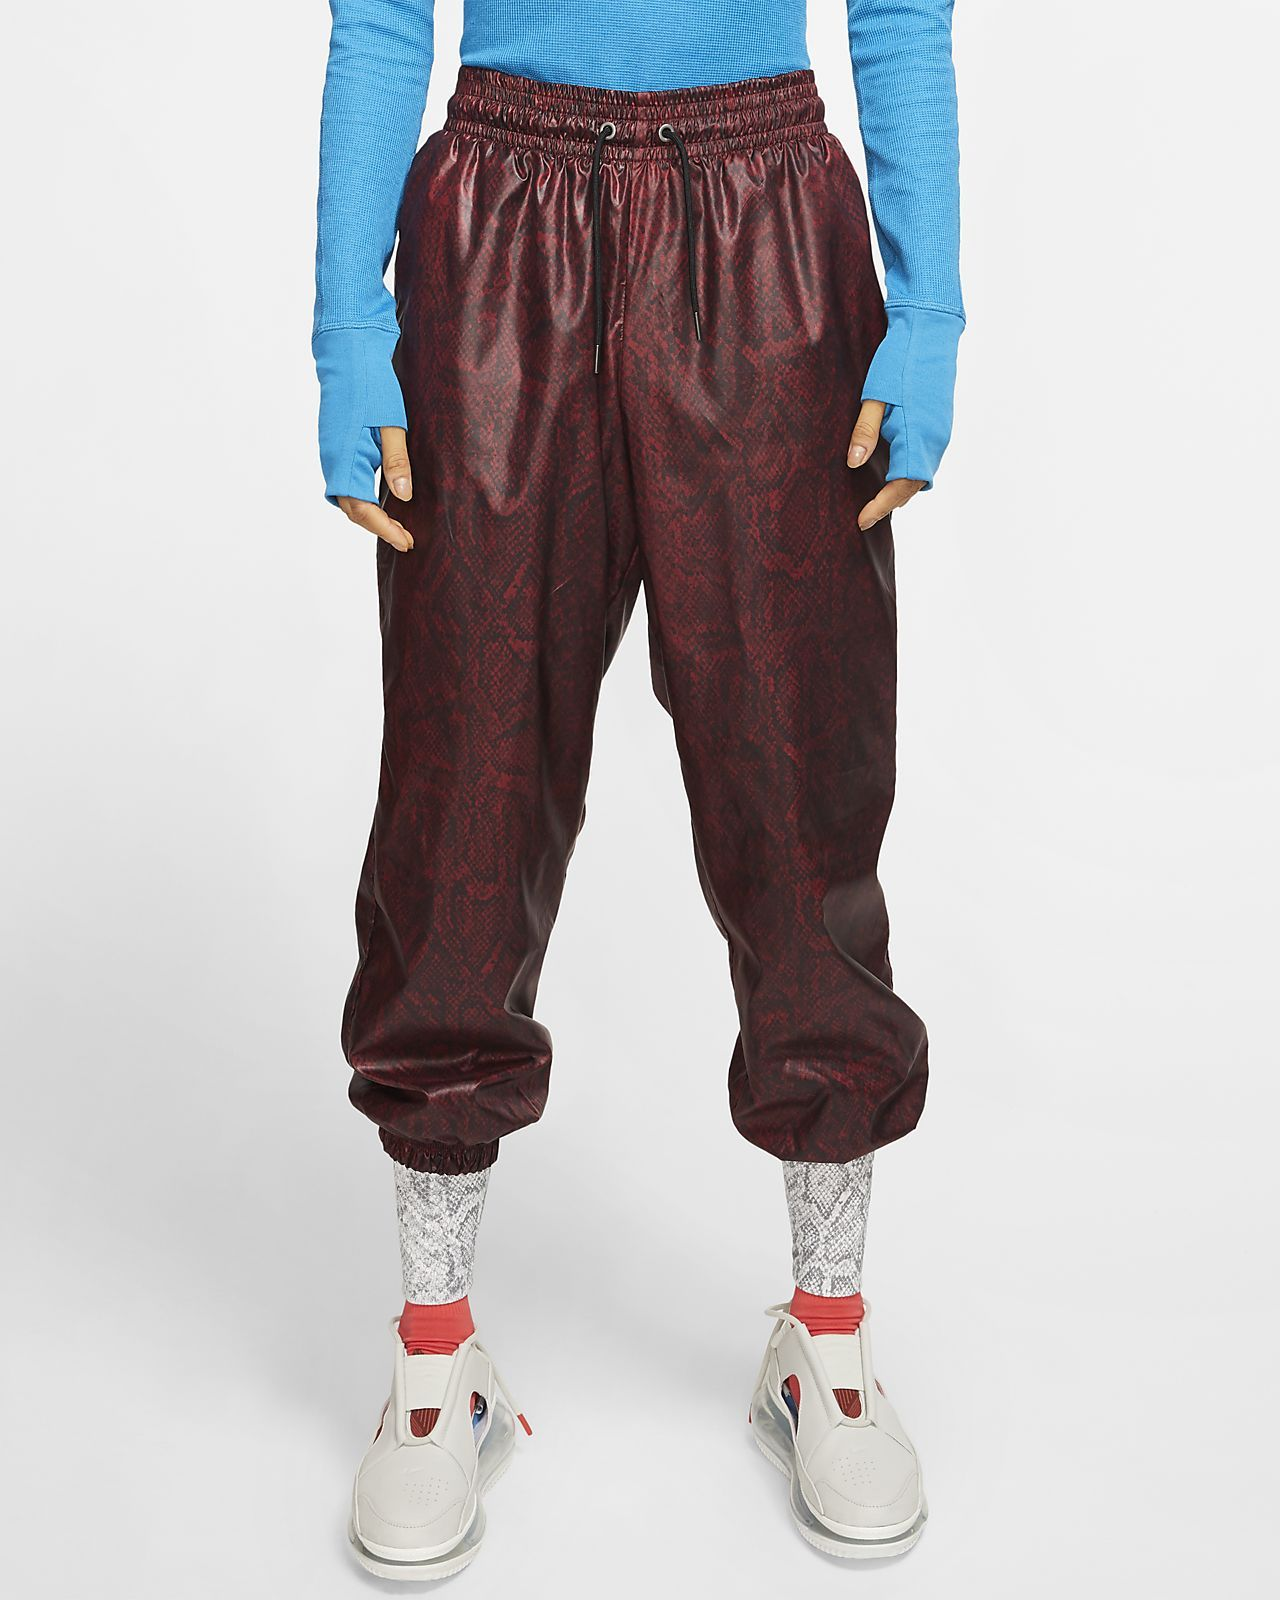 Photo of Nike Sportswear Women's Woven Pants. Nike.com